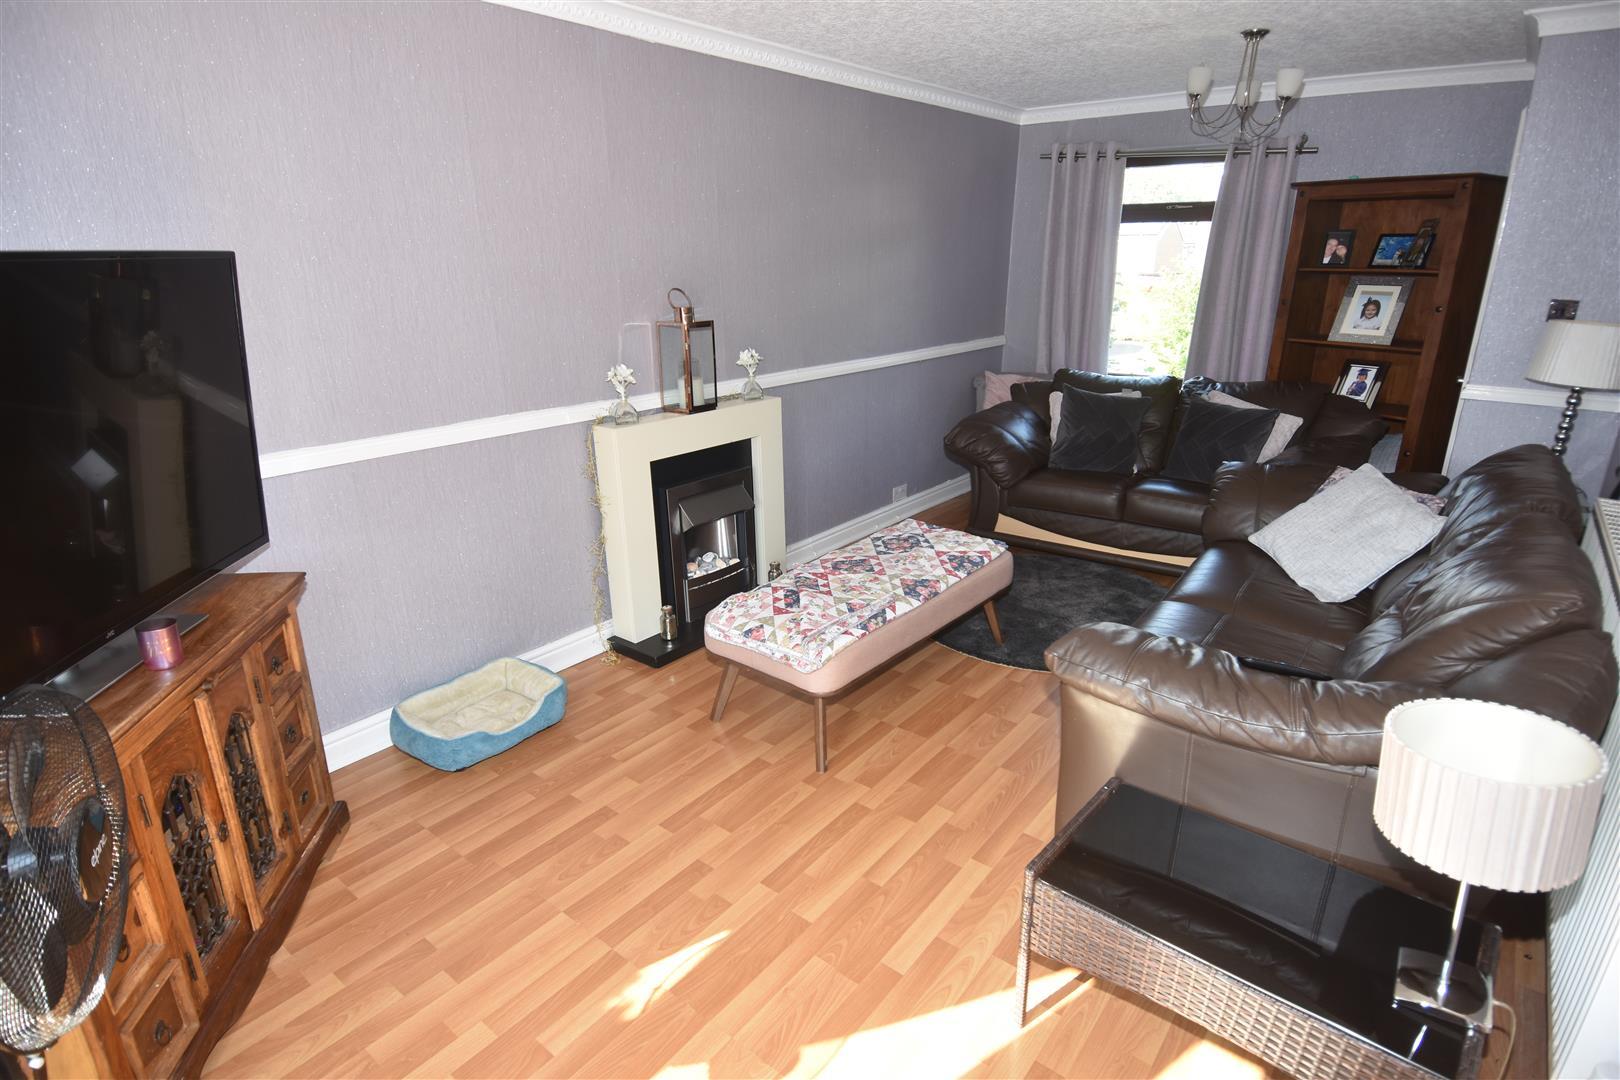 3 bed house for sale in Asholme Close, Bromford Bridge, Birmingham 3